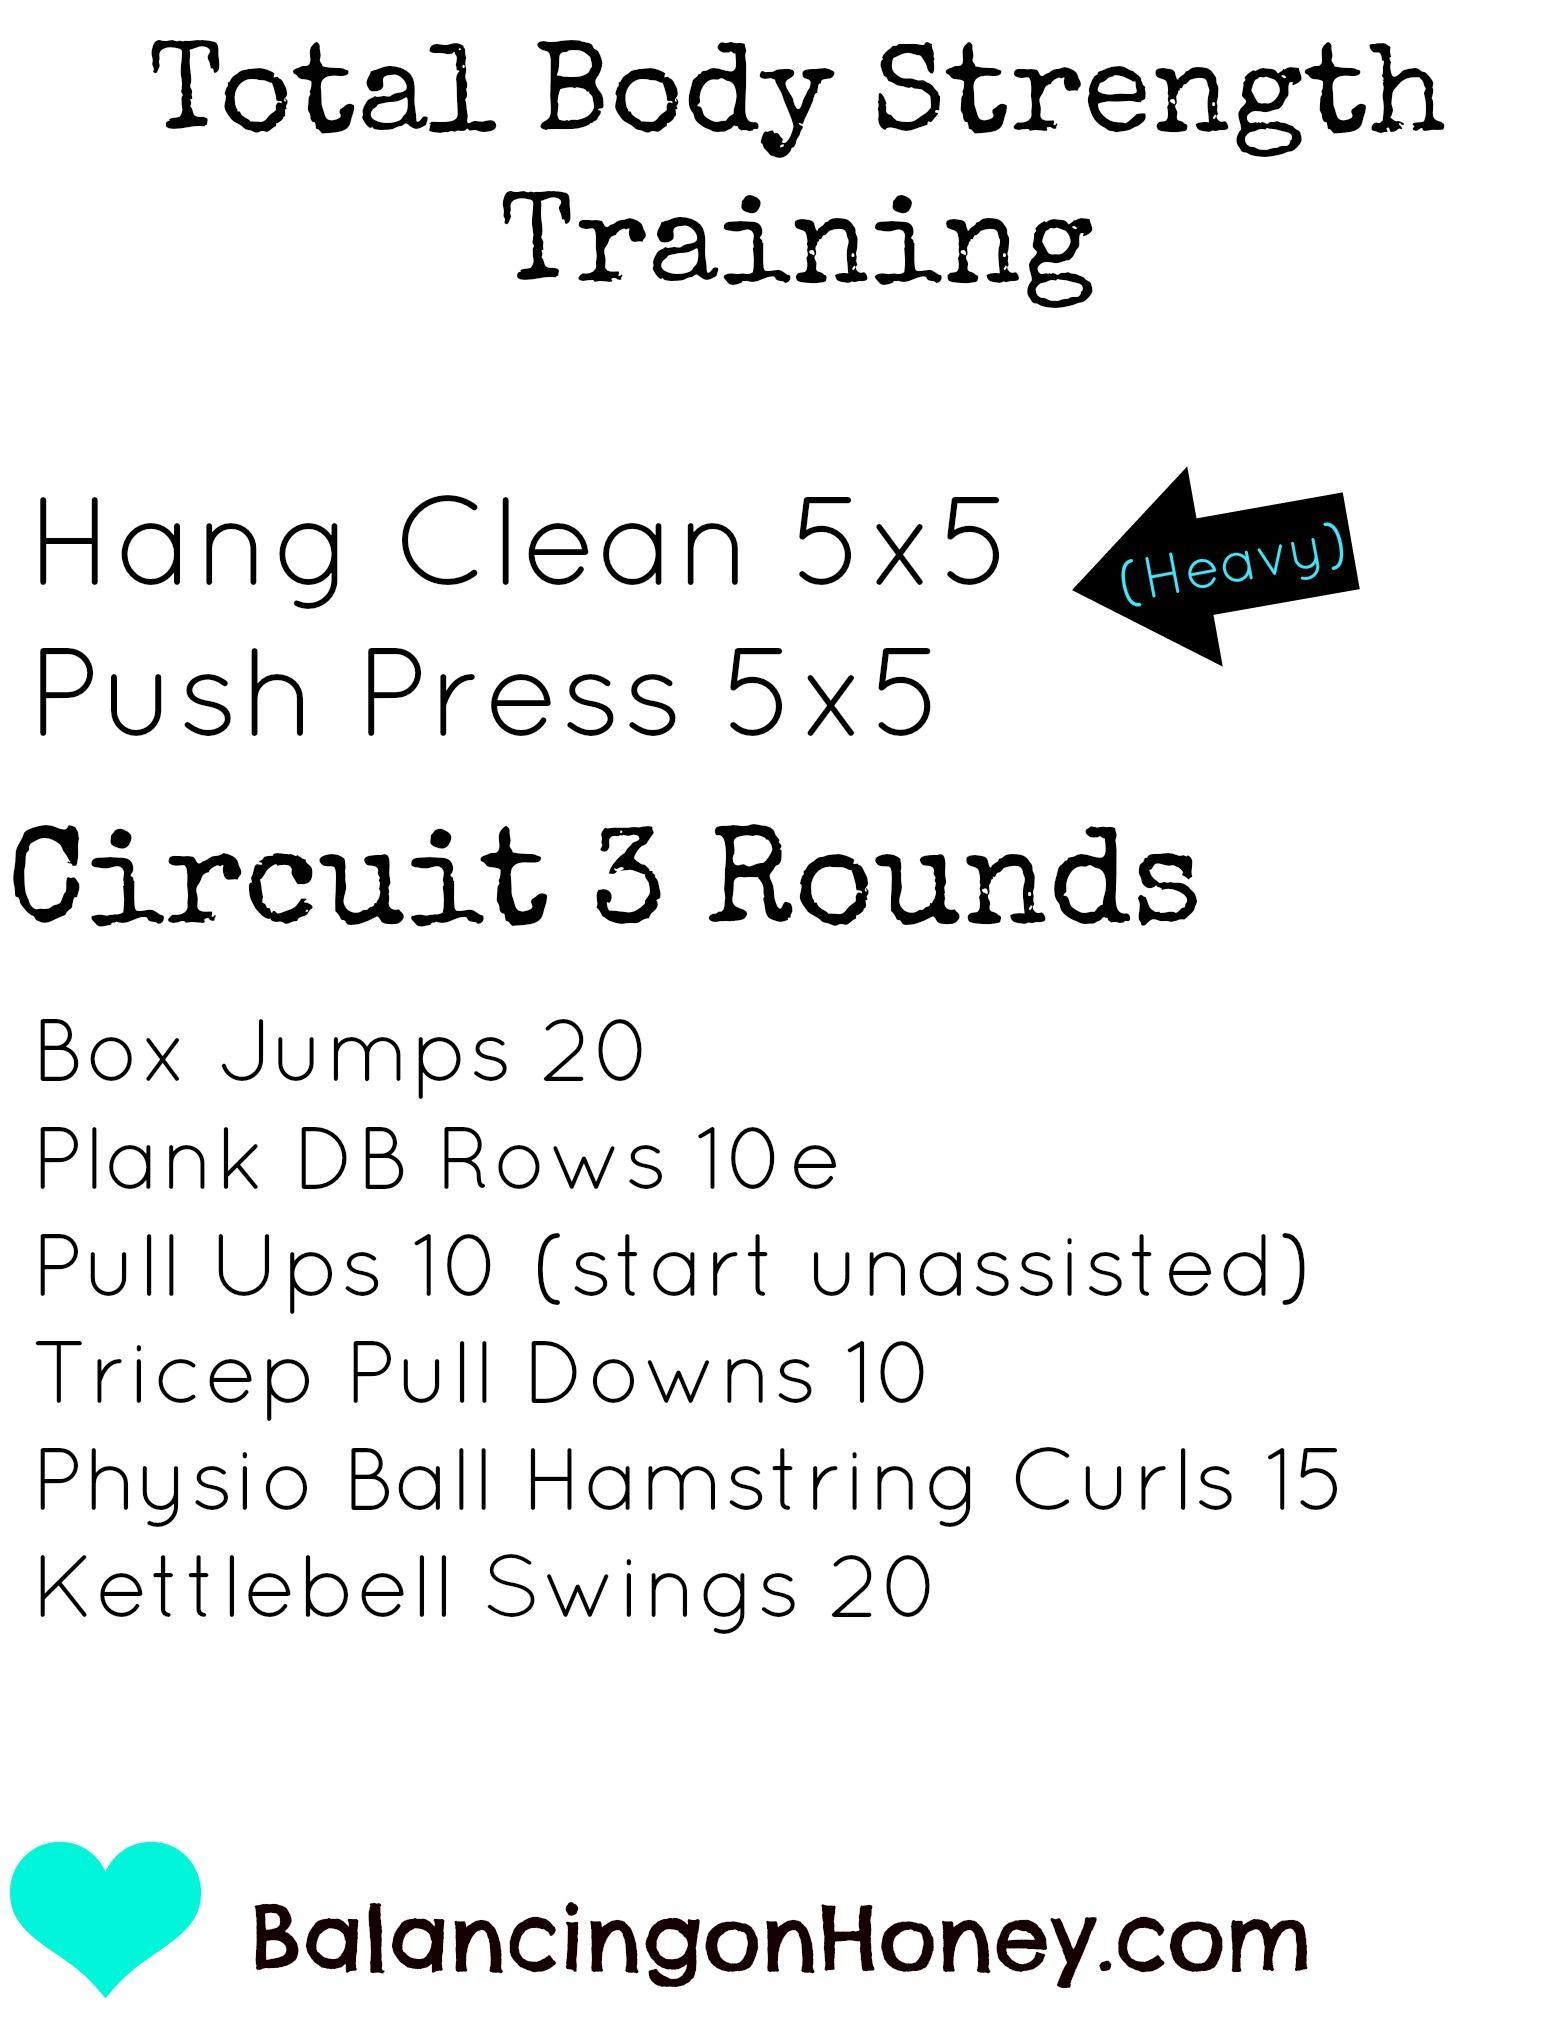 Total Body Strength Training